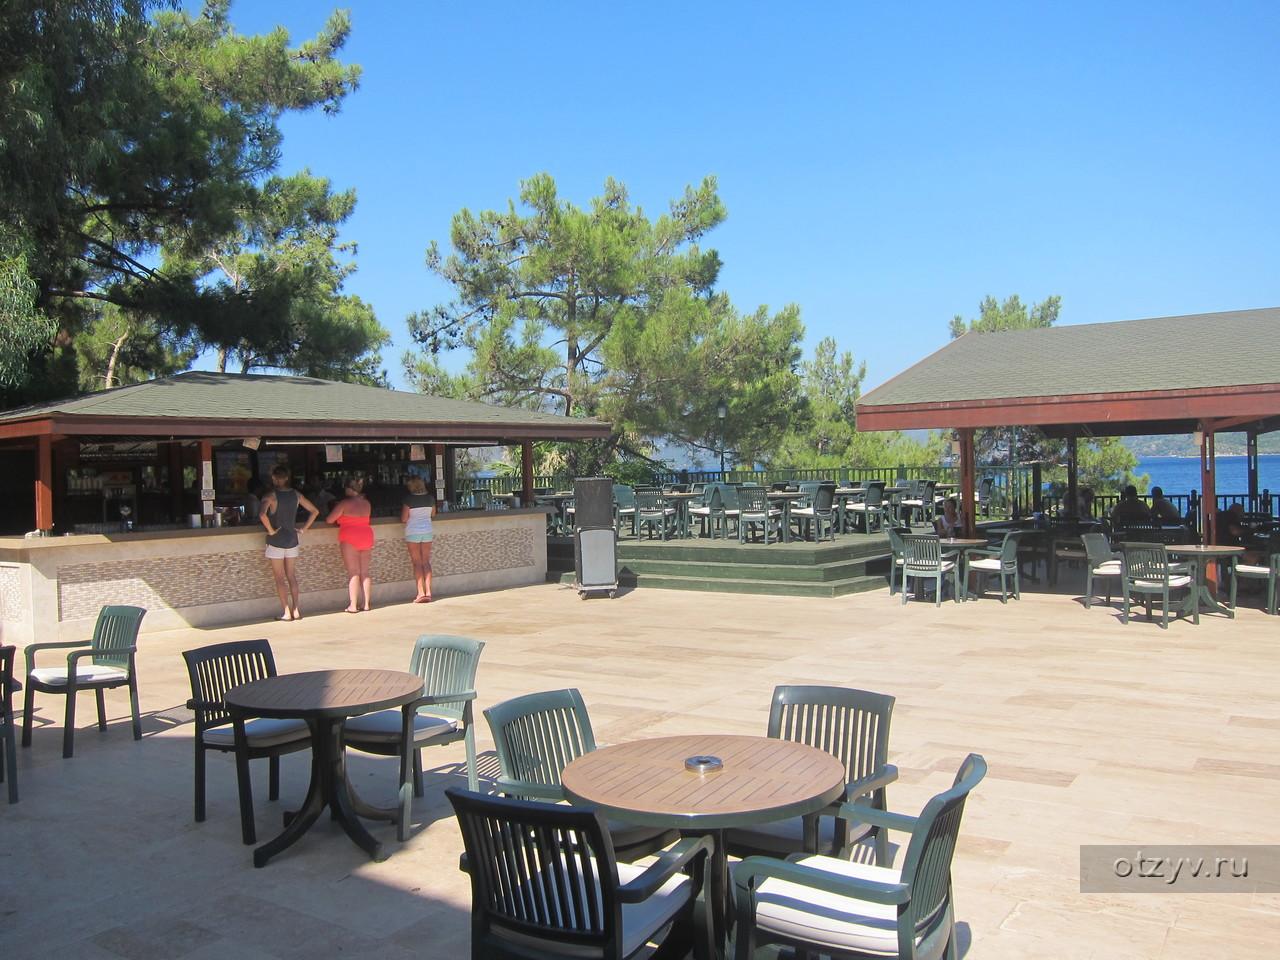 Majesty Club Kemer Beach 5 HV - rest with taste